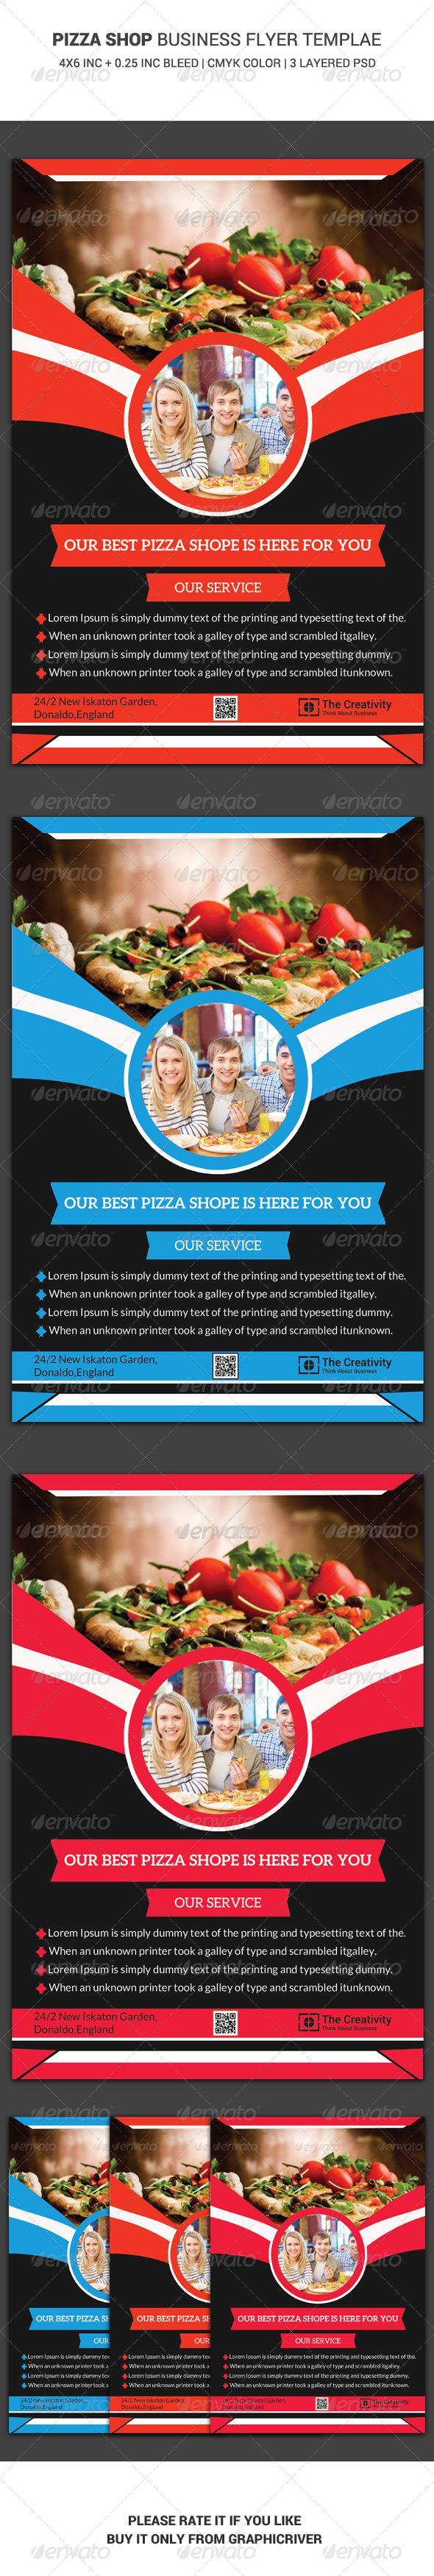 GraphicRiver Pizza Shop Business Flyer Template 6456659